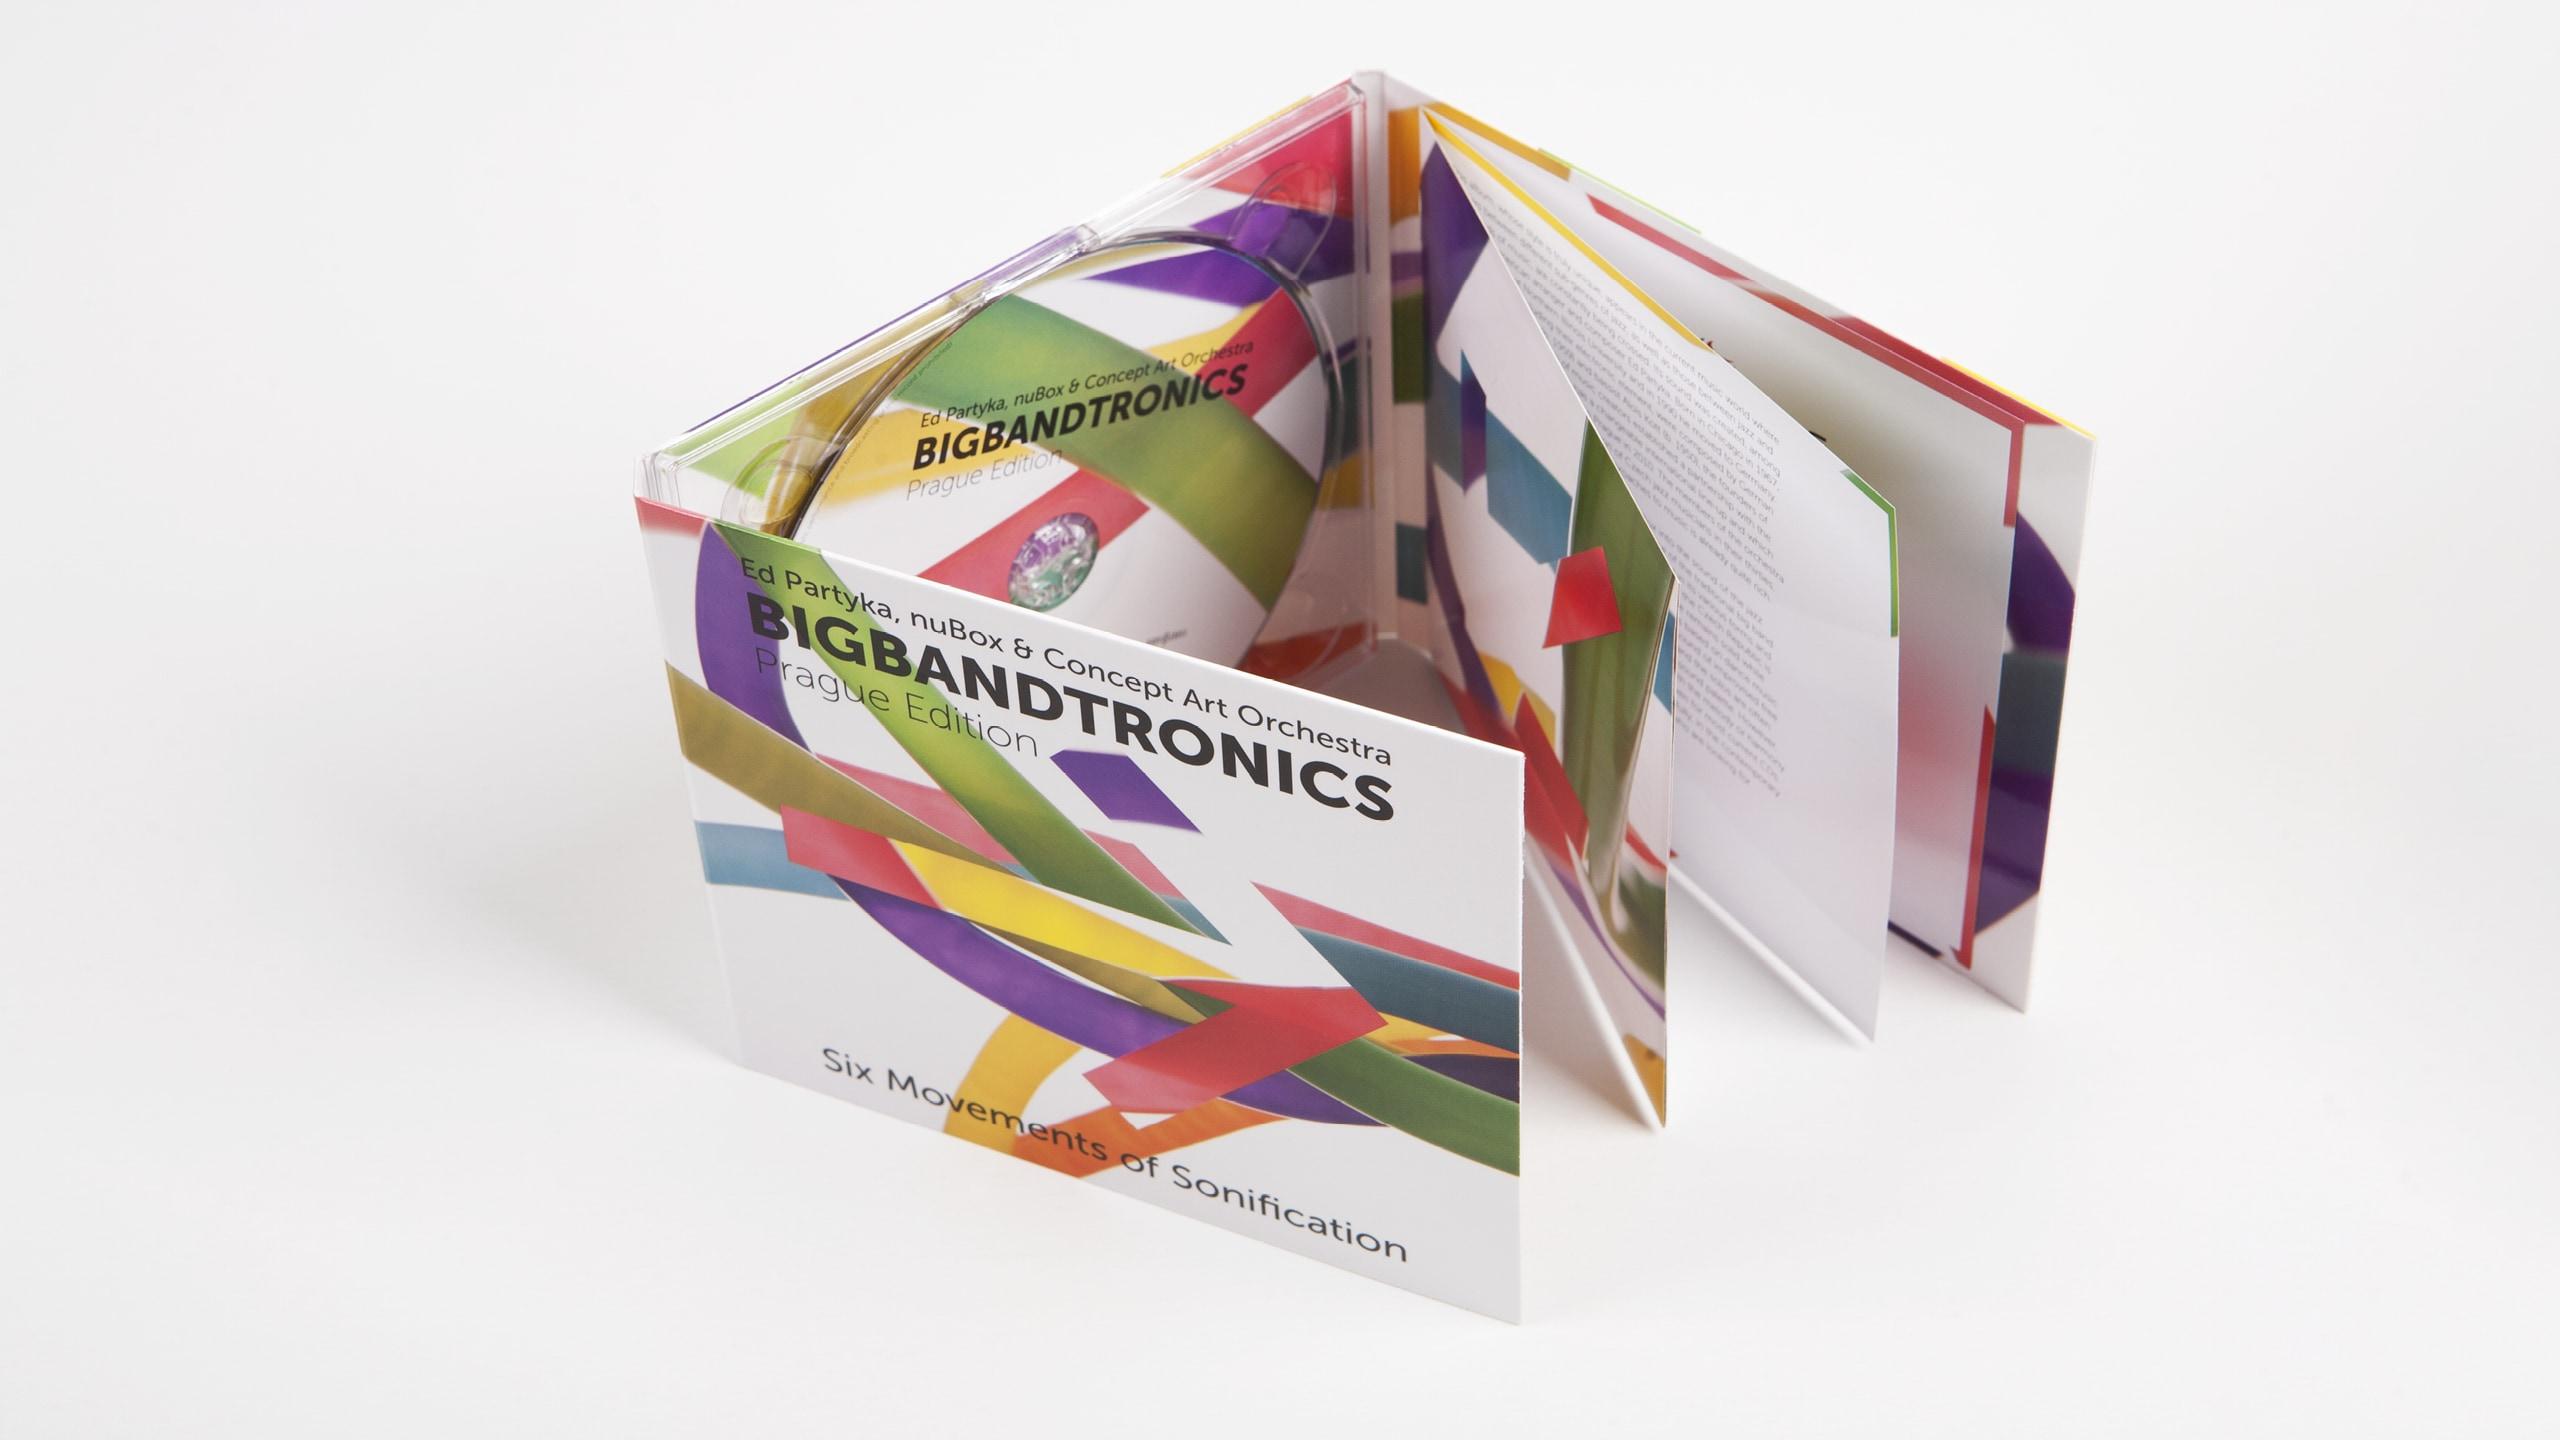 Bigbandtronics_1